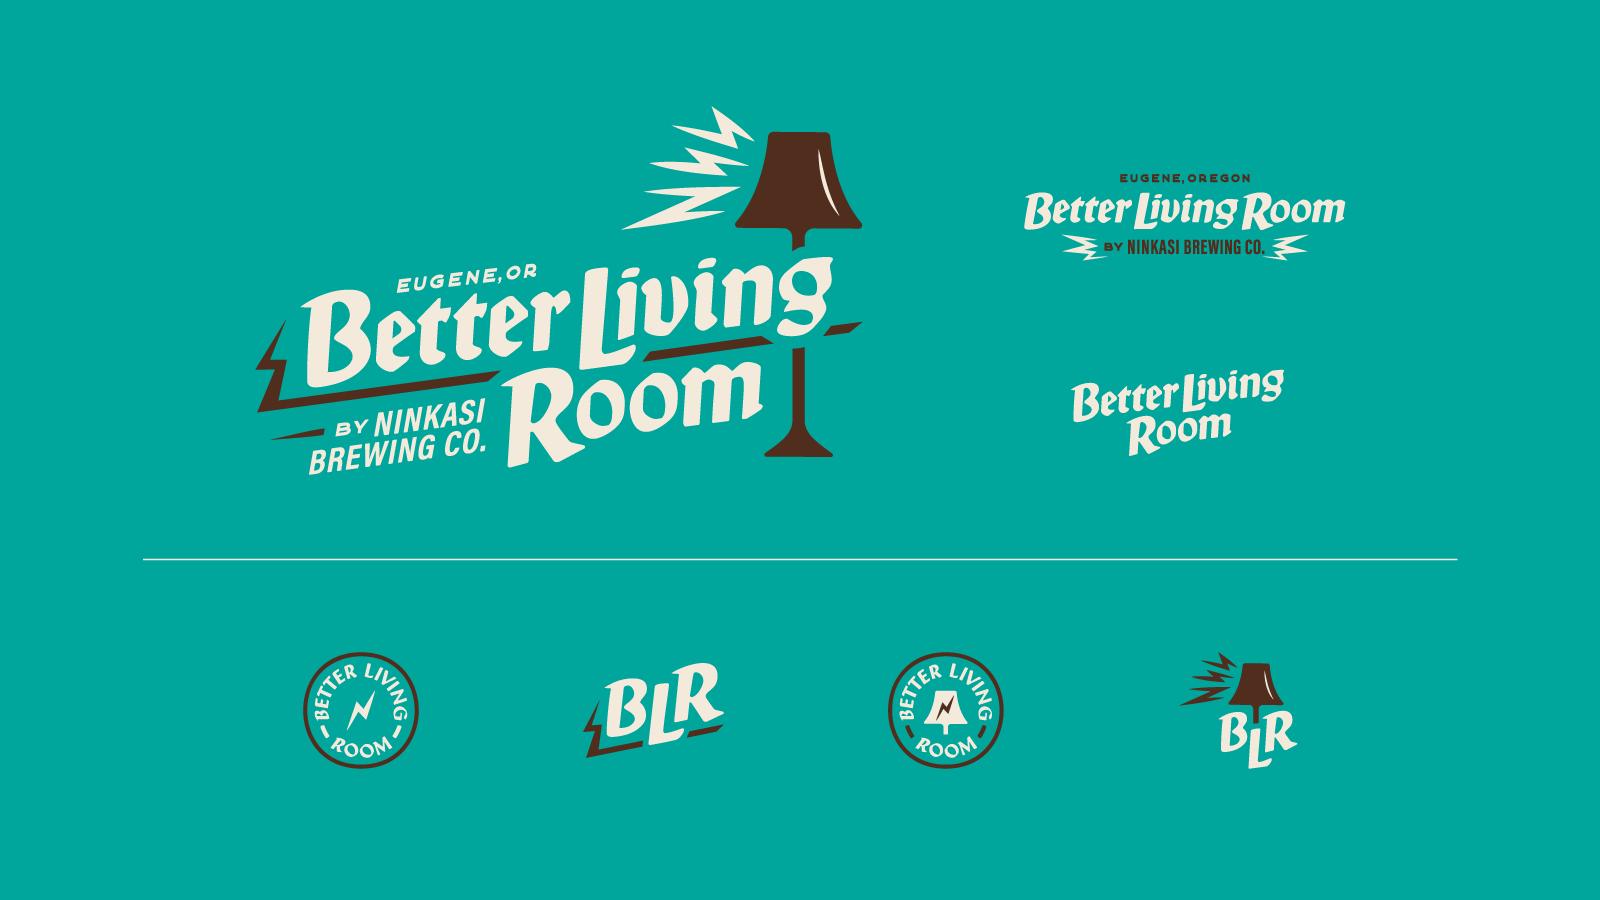 Logo grid of Better Living Room logo variations